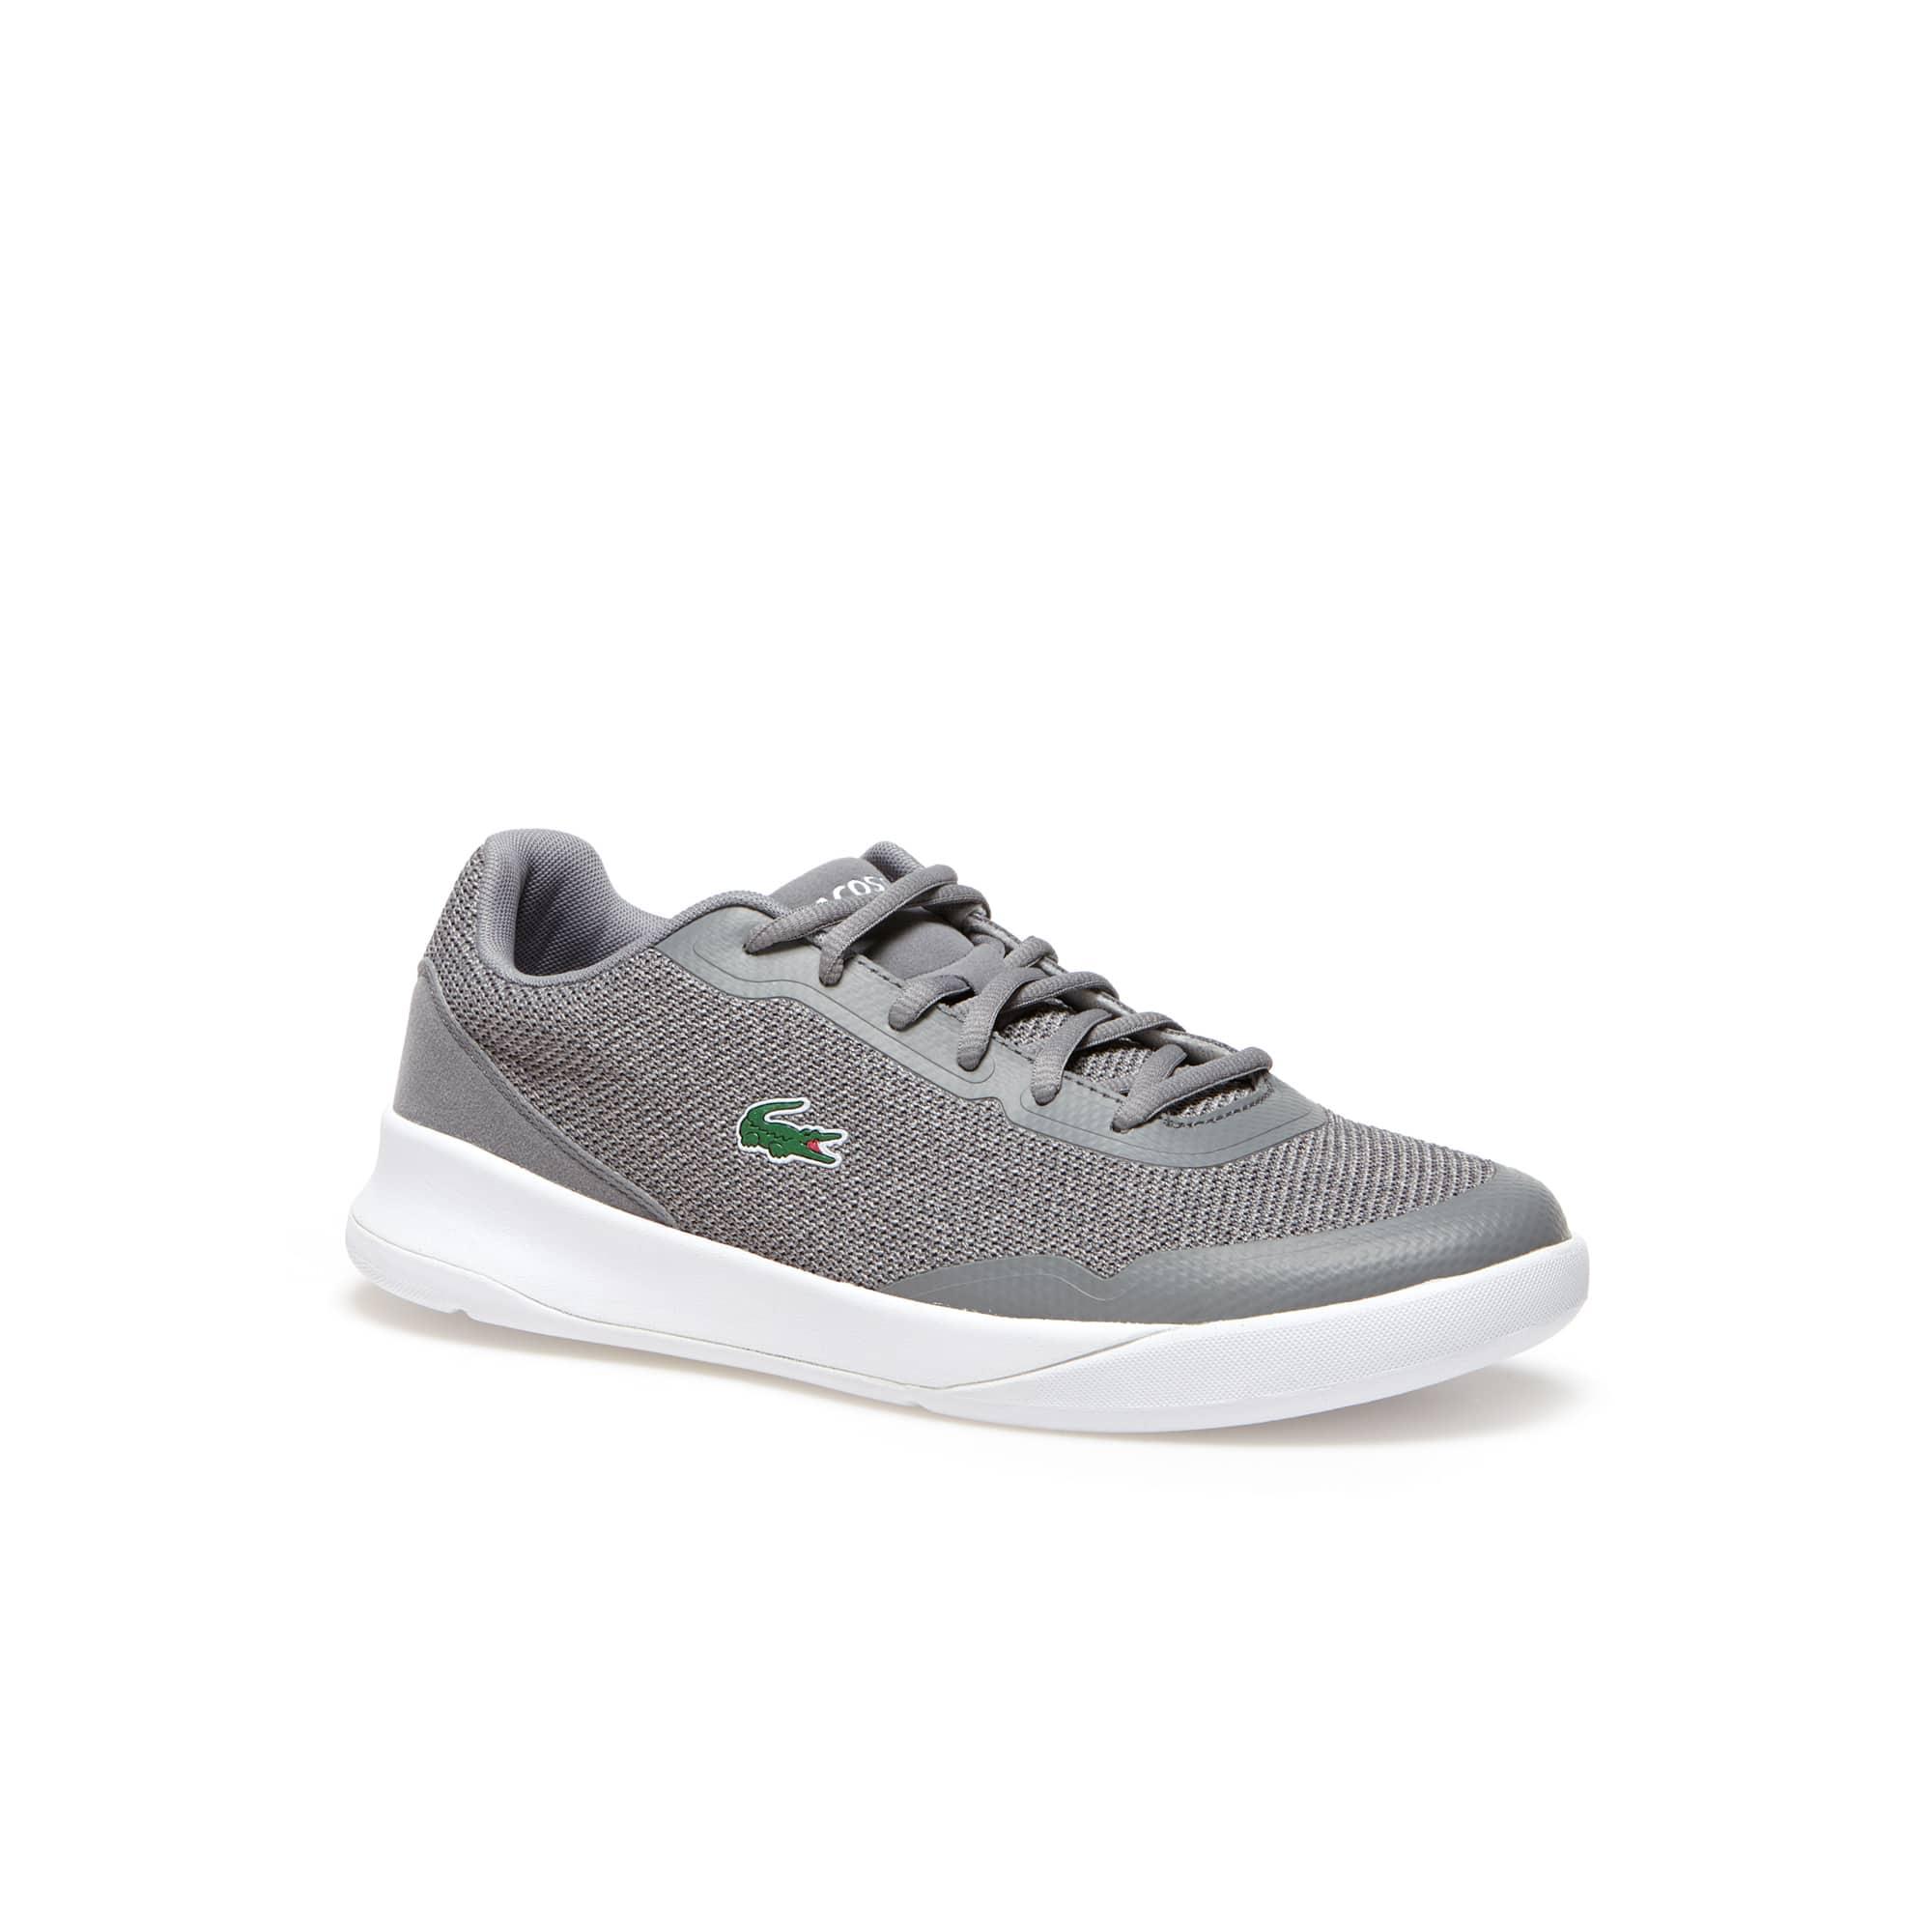 Herren-Sneakers LT SPIRIT aus Stoff